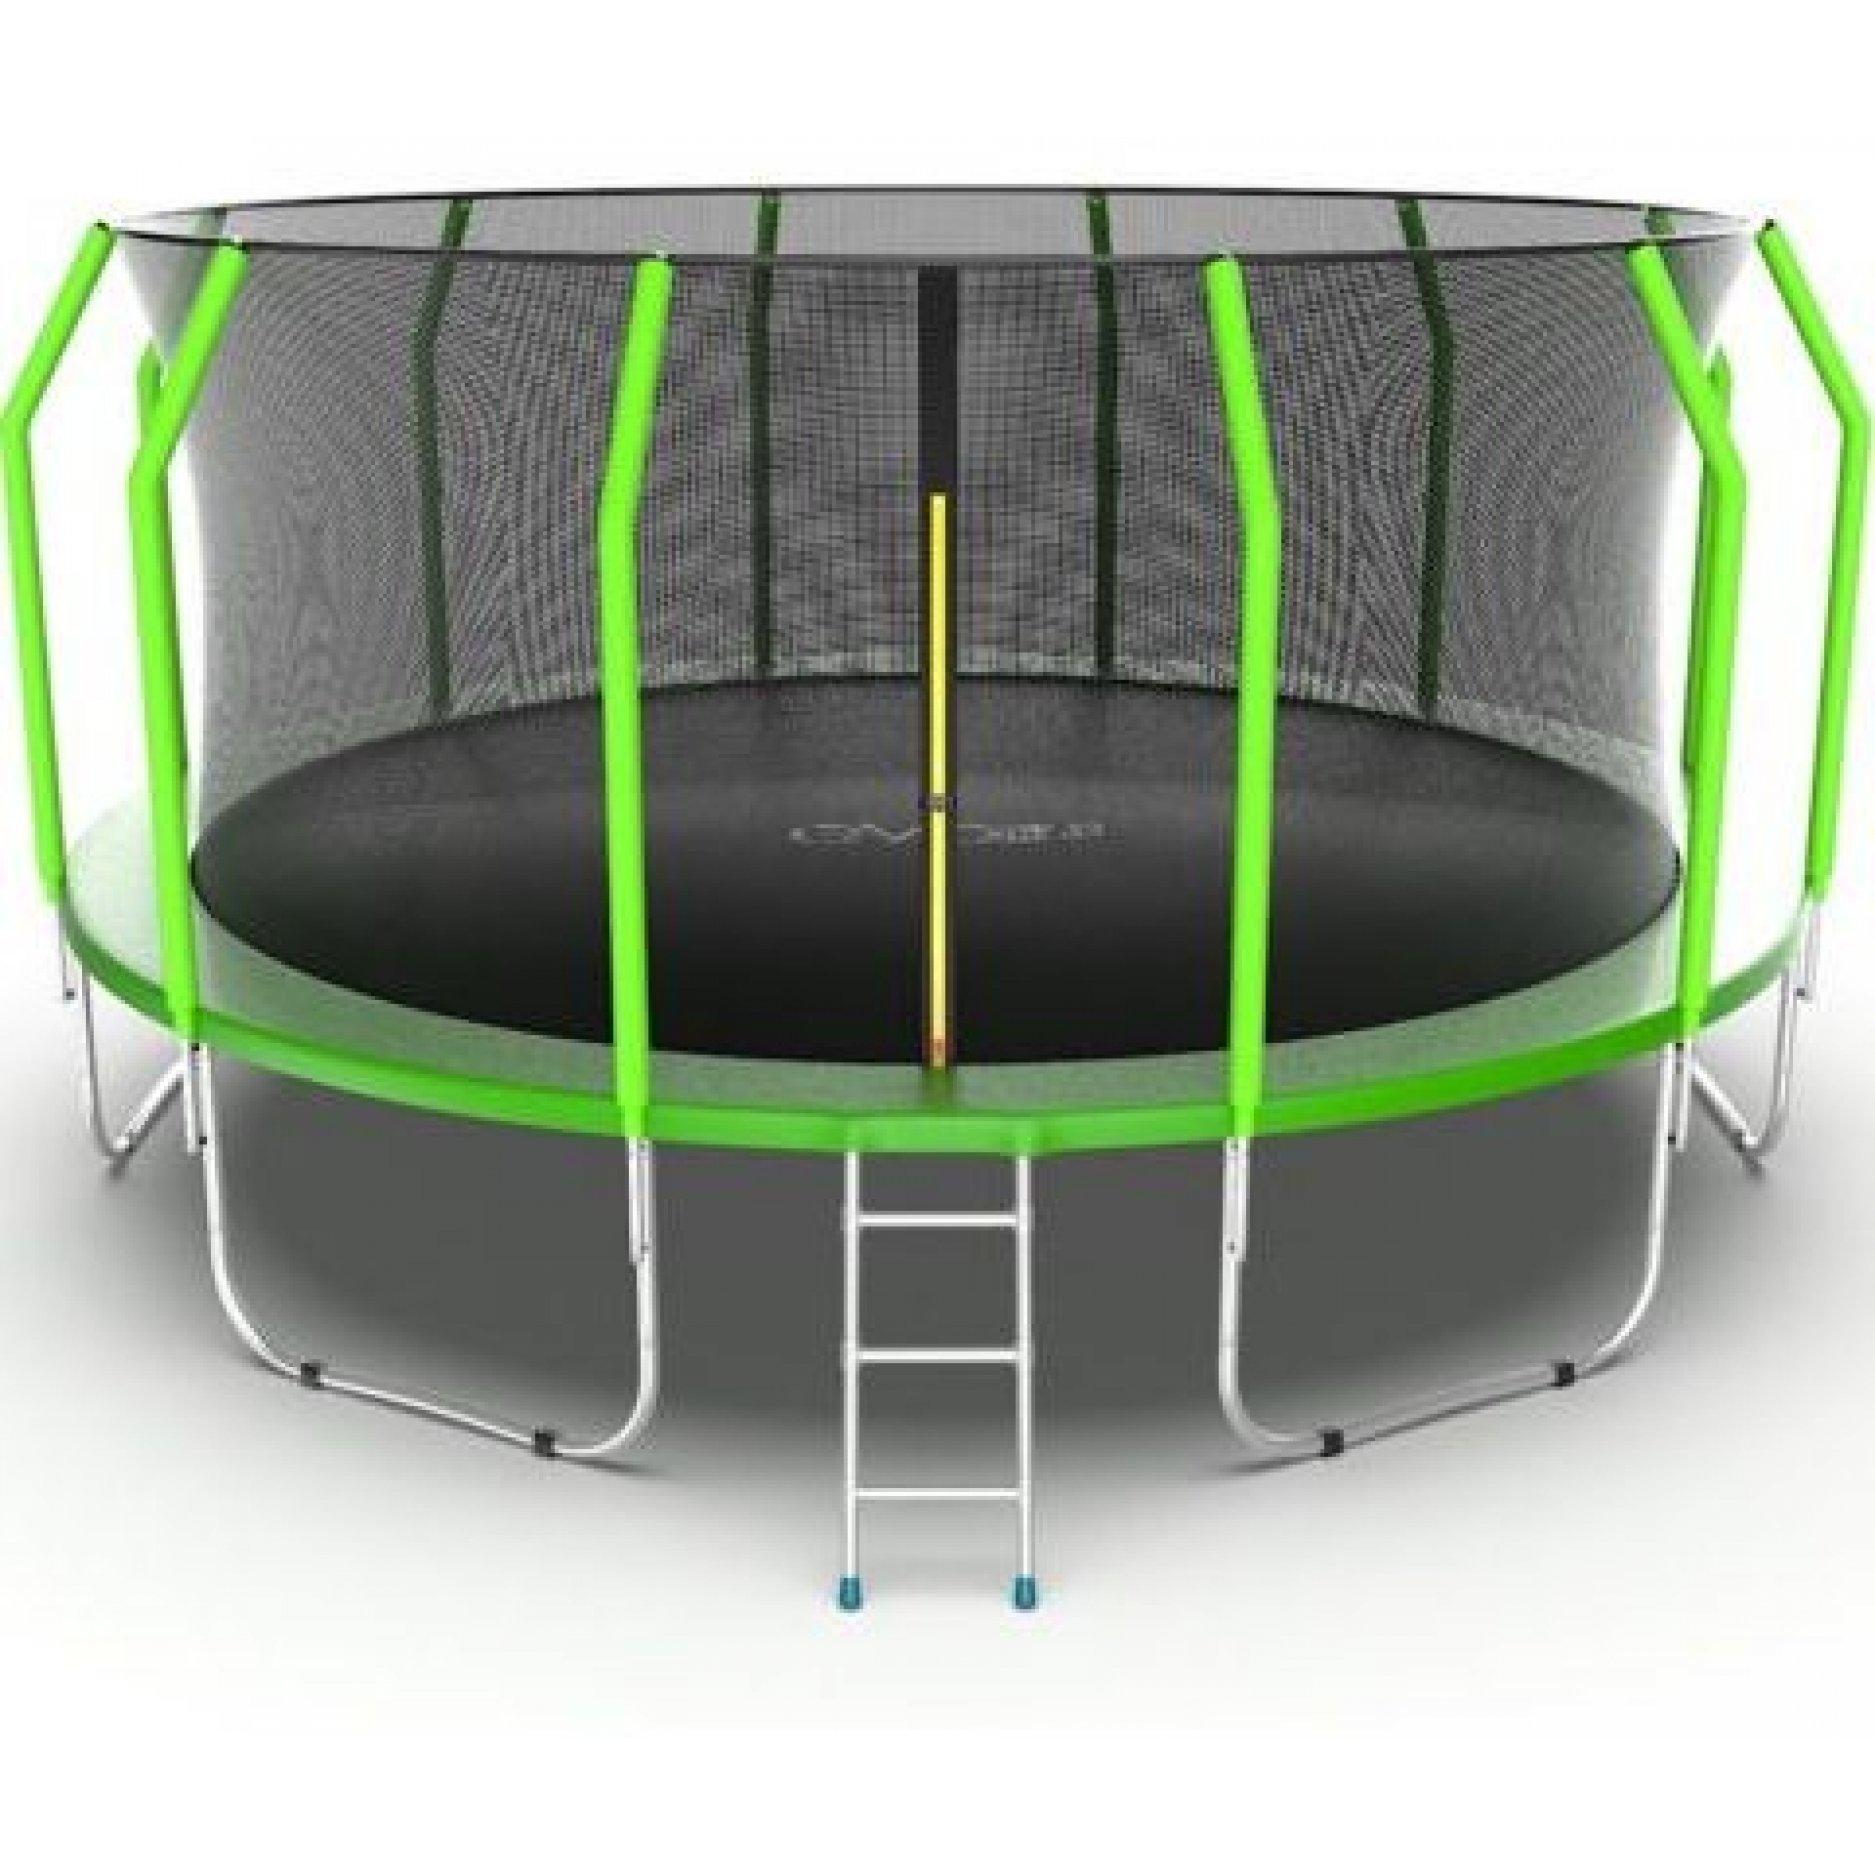 Батут EVO Jump Cosmo 16ft (Green) + Lower net. с внутренней сеткой и лестницей